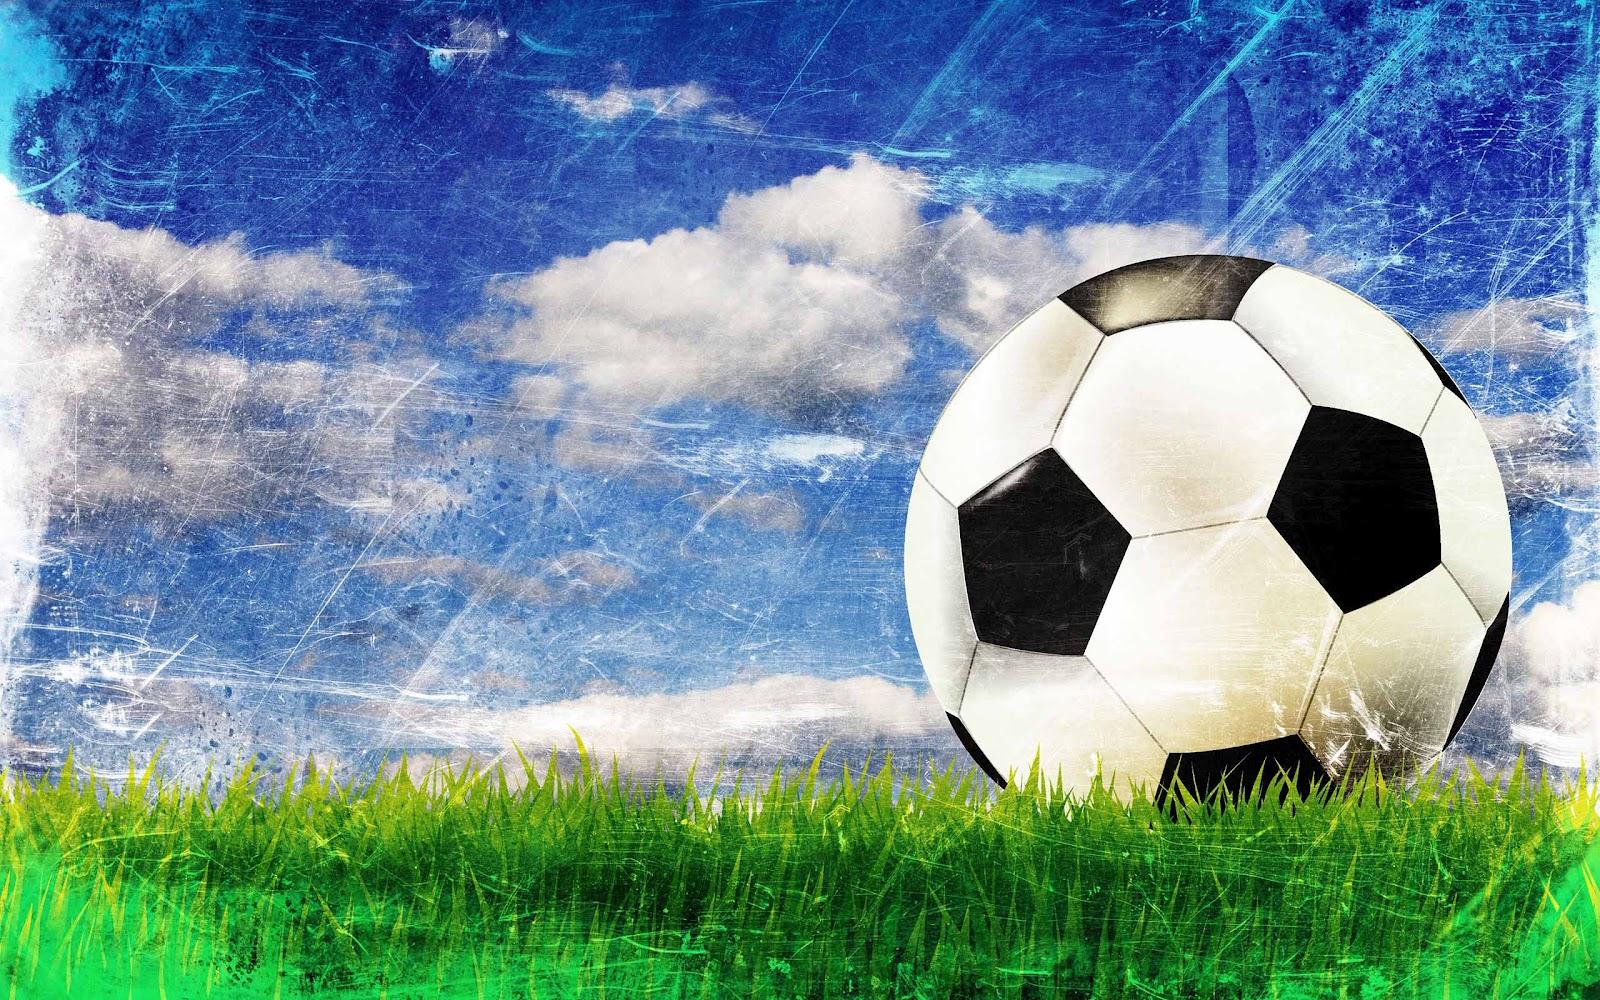 desktop wallpapers sports soccer backgrounds games13jpg 1600x1000